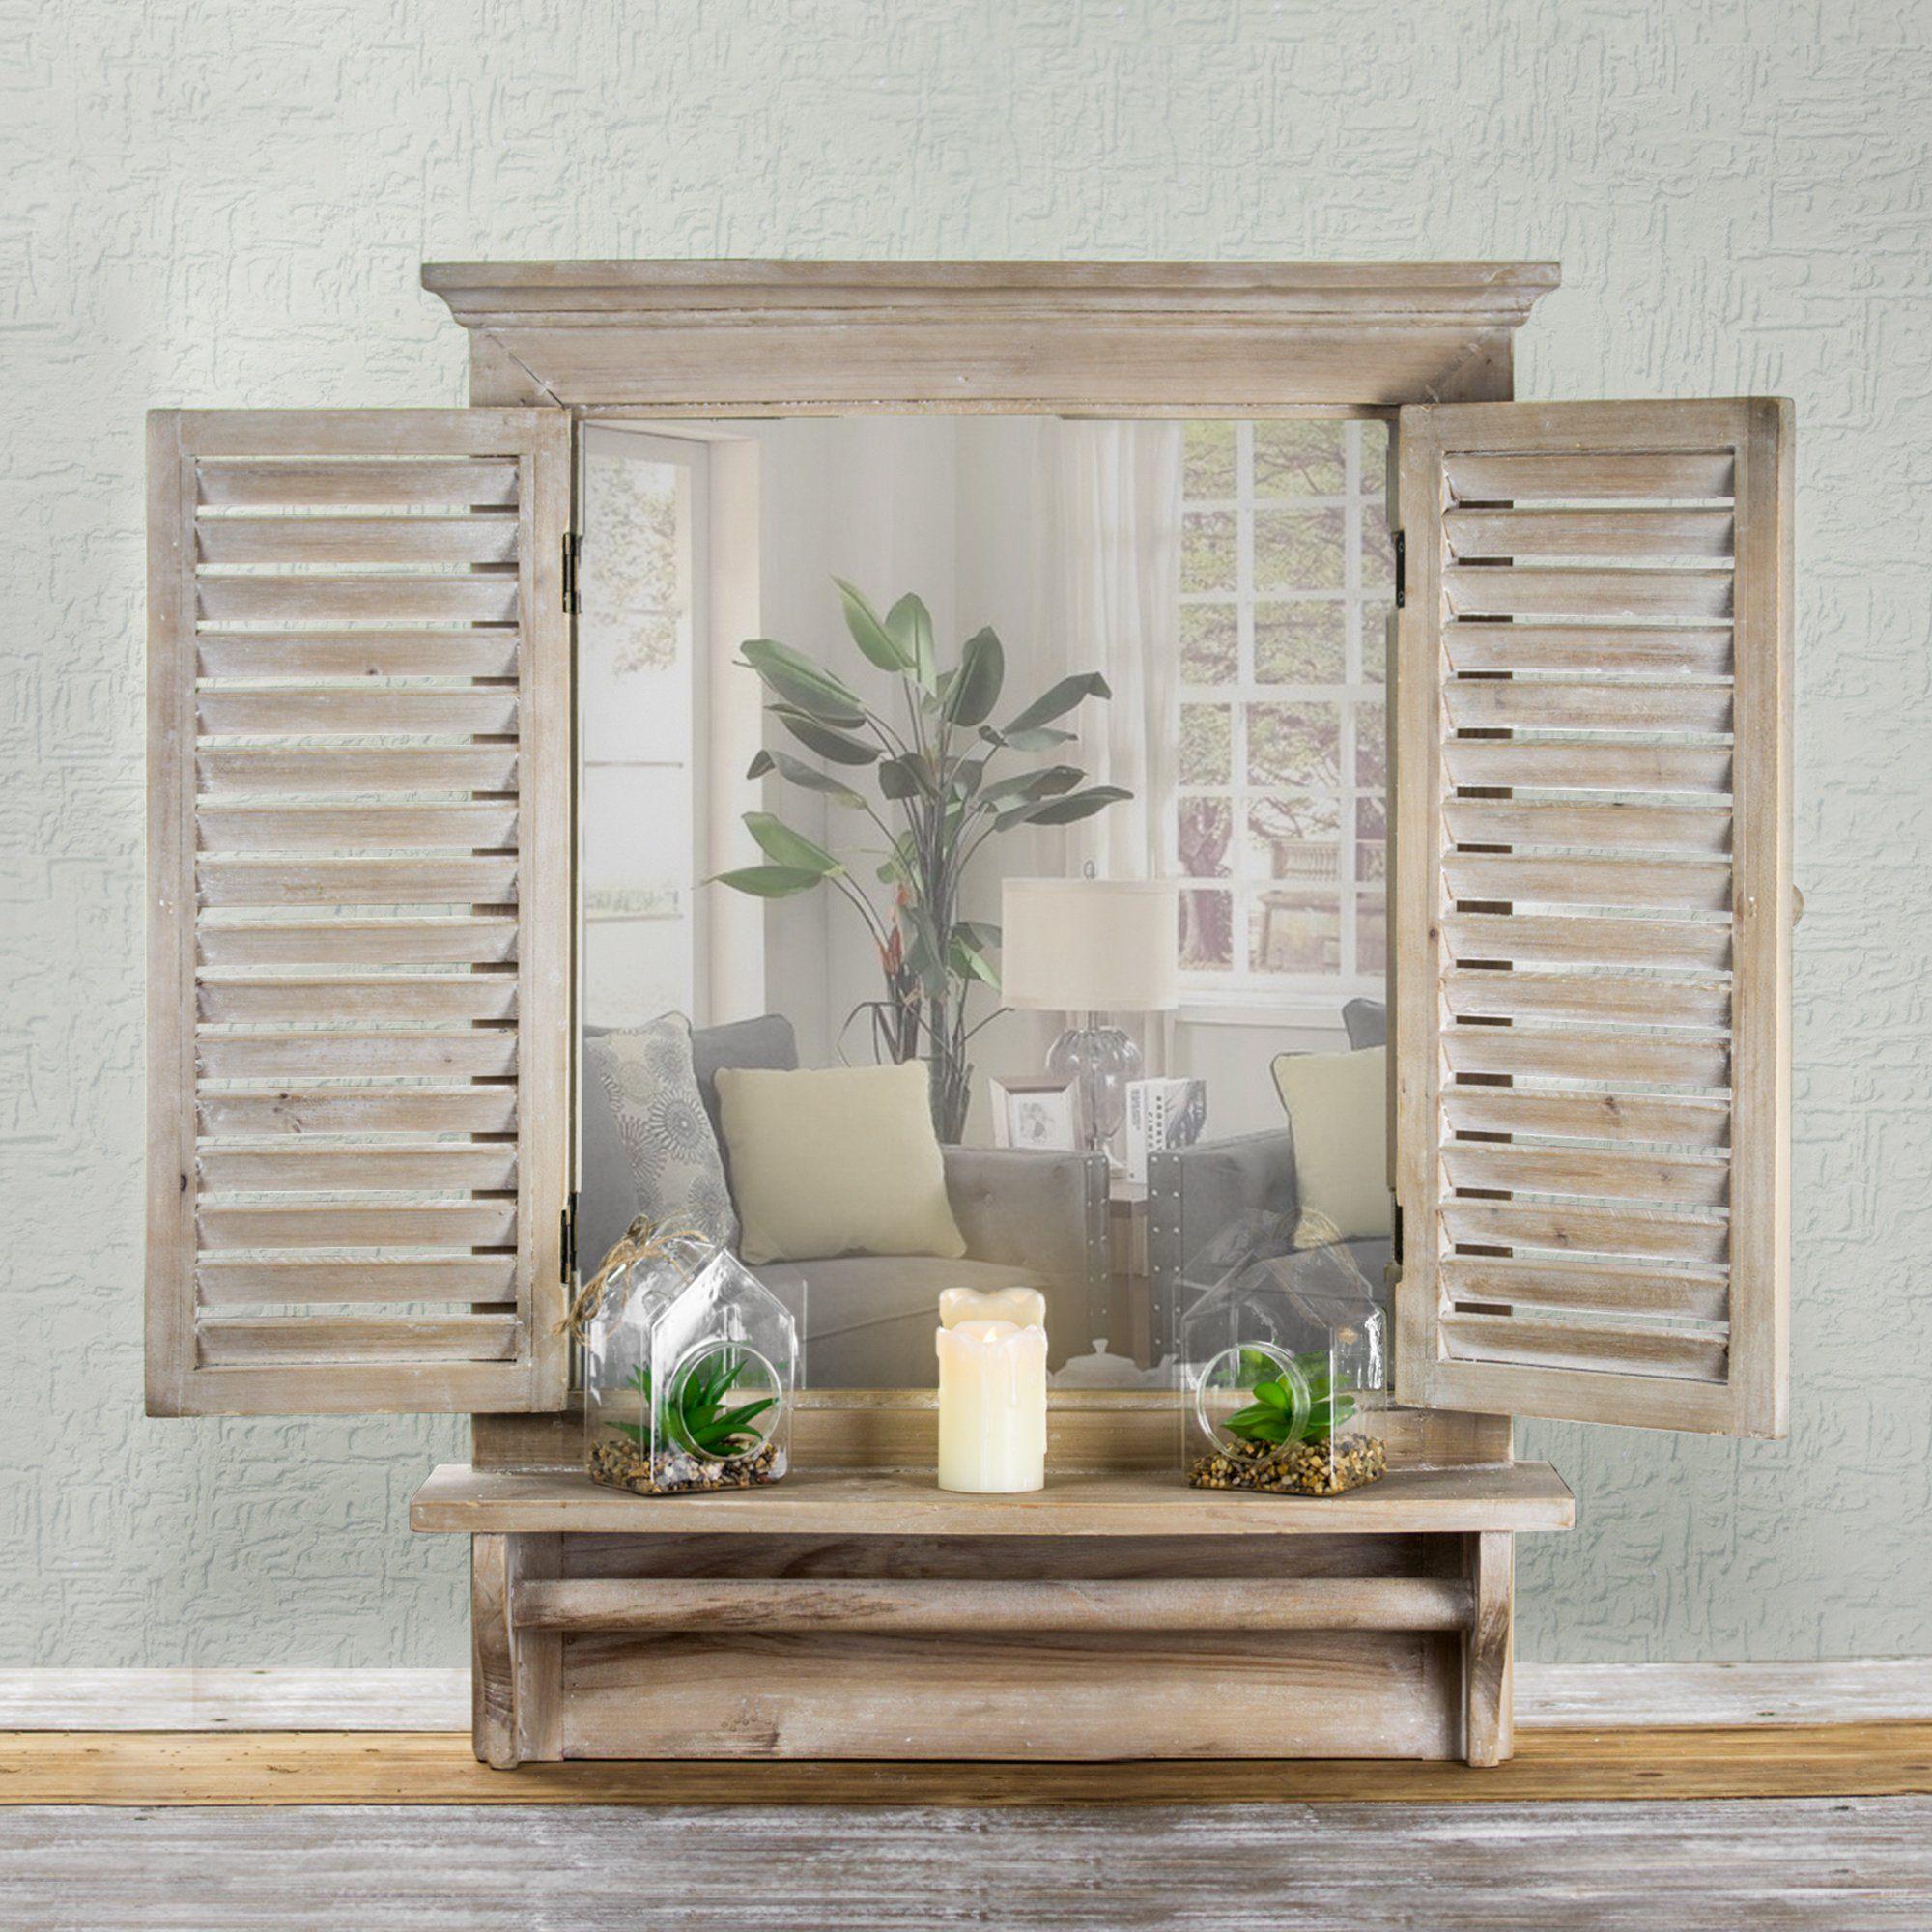 Crystal Art Window Shutter Vanity Wall Mirror W/Shelf and